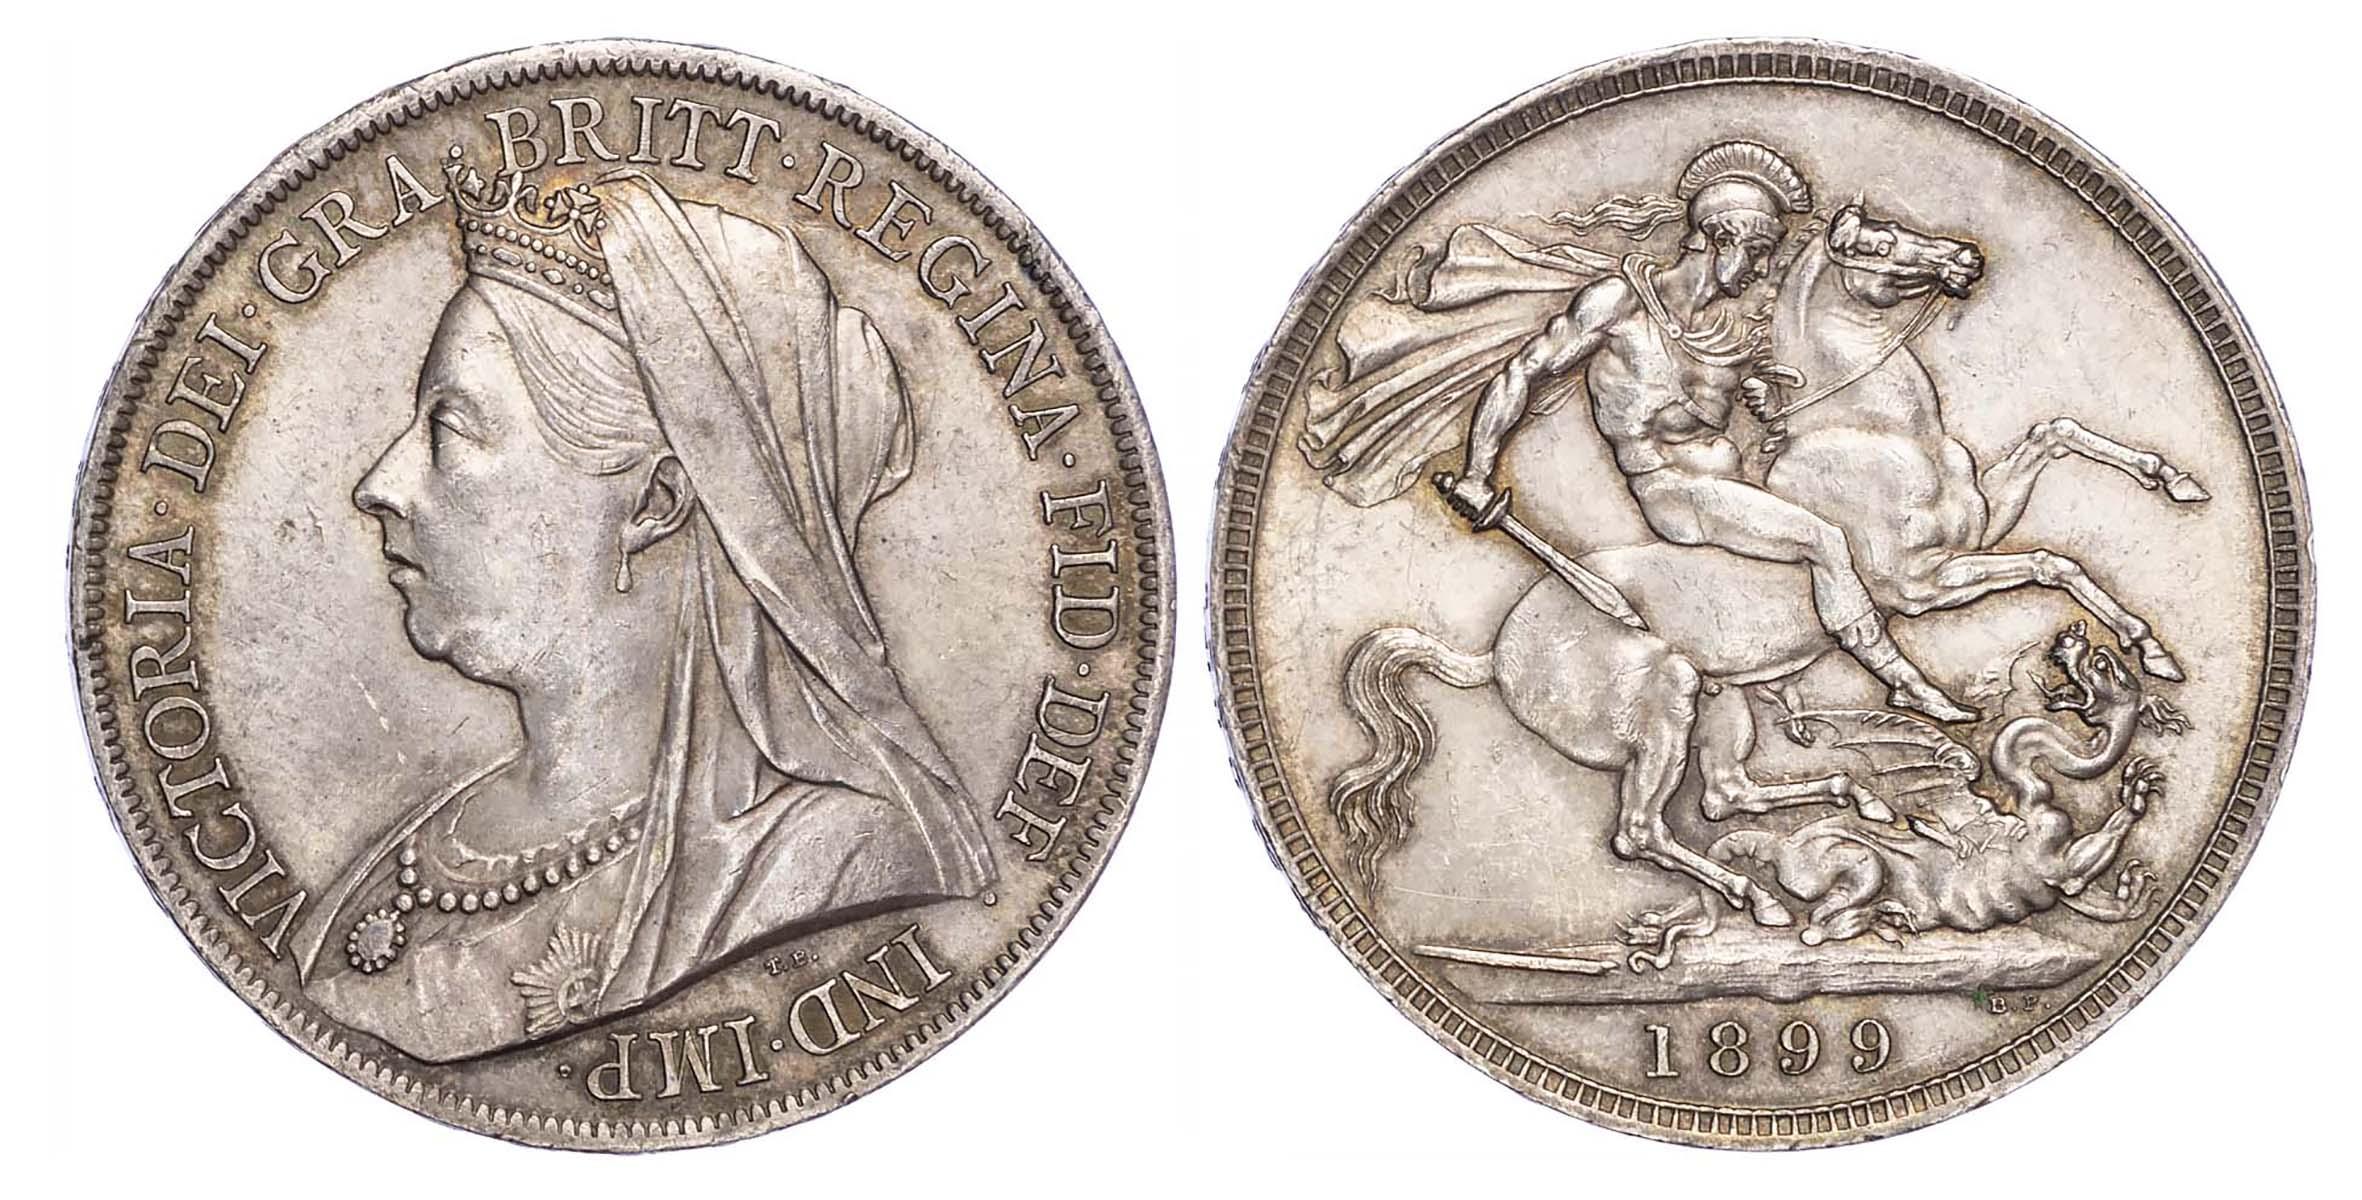 Victoria (1837-1901), 1899, Crown, LXIII edge